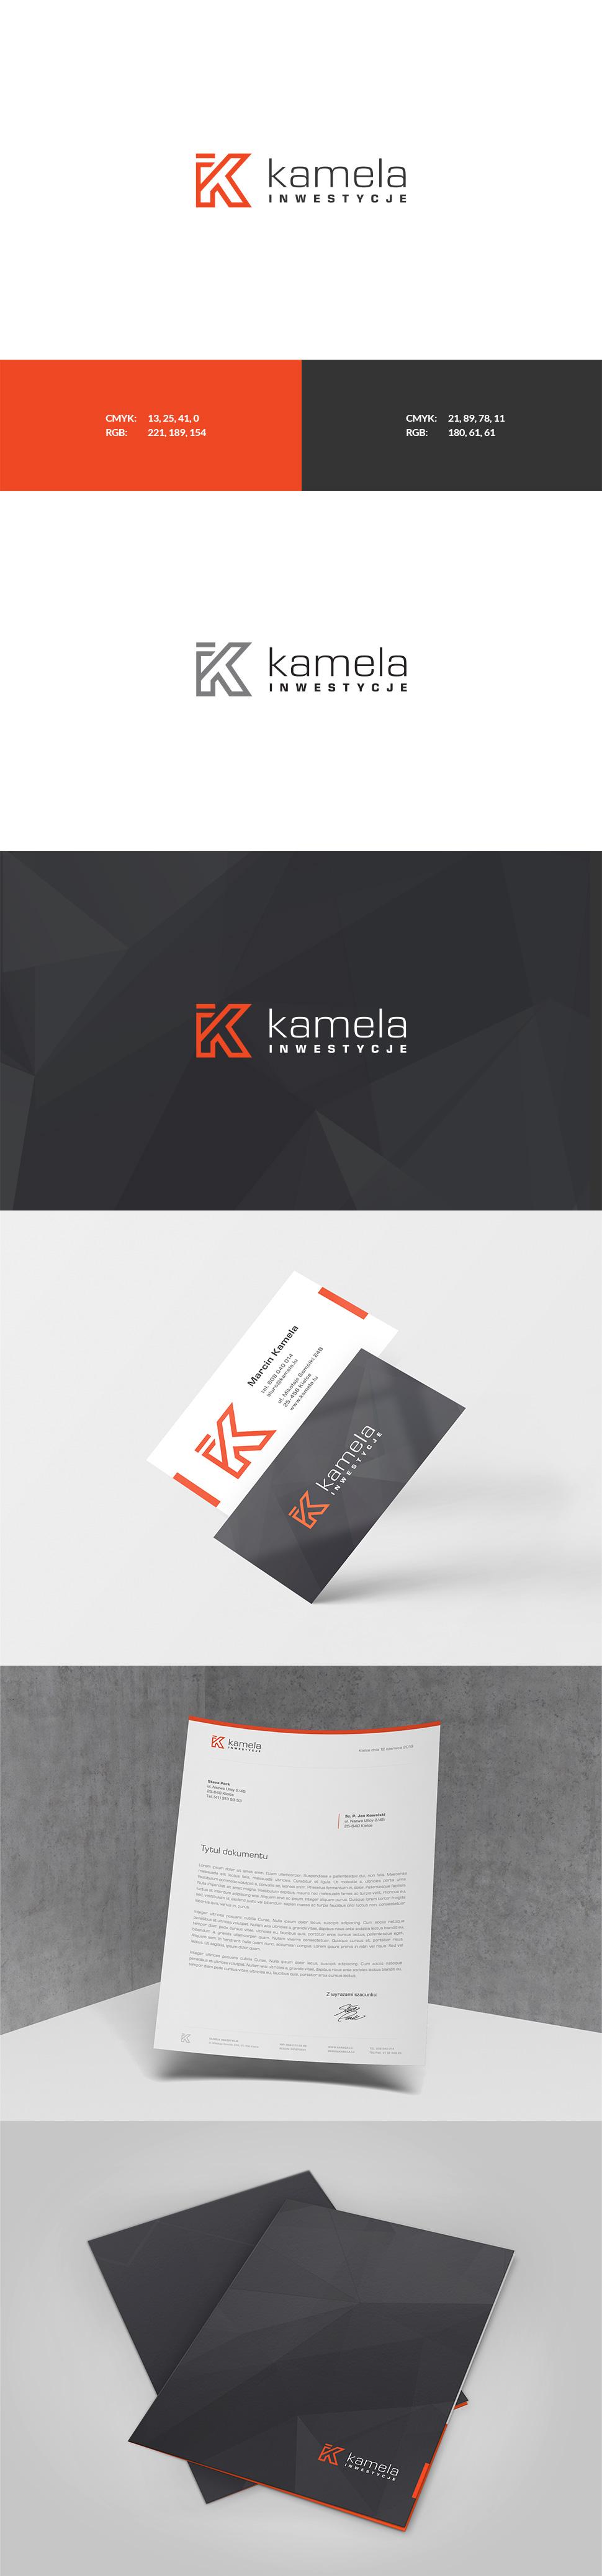 Identification Kamela